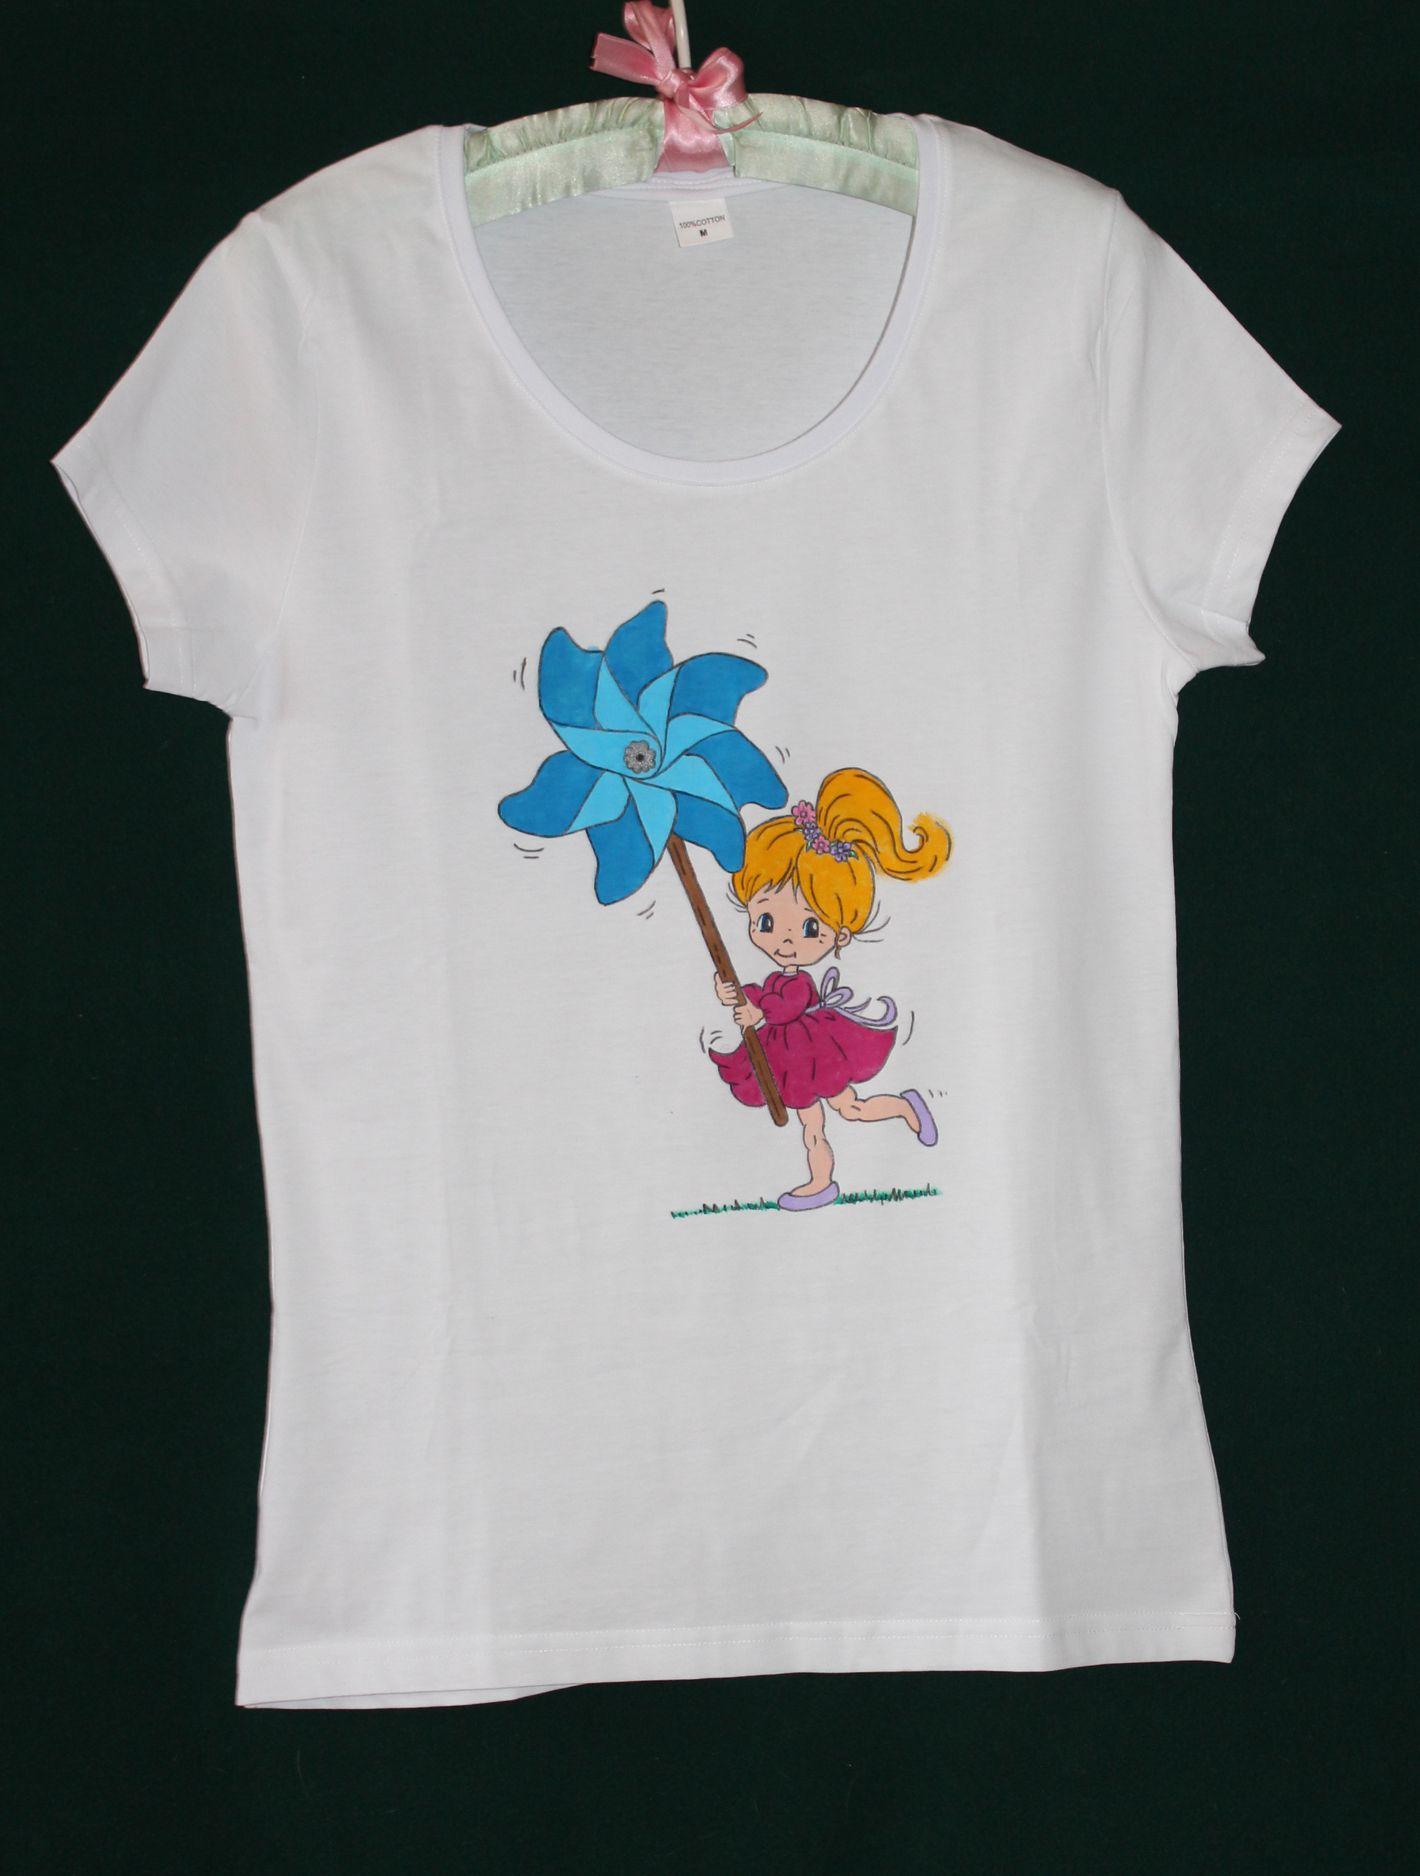 T shirt handmade design - Girl Thelollipopdesign Handmade Design Accessories Customdesign